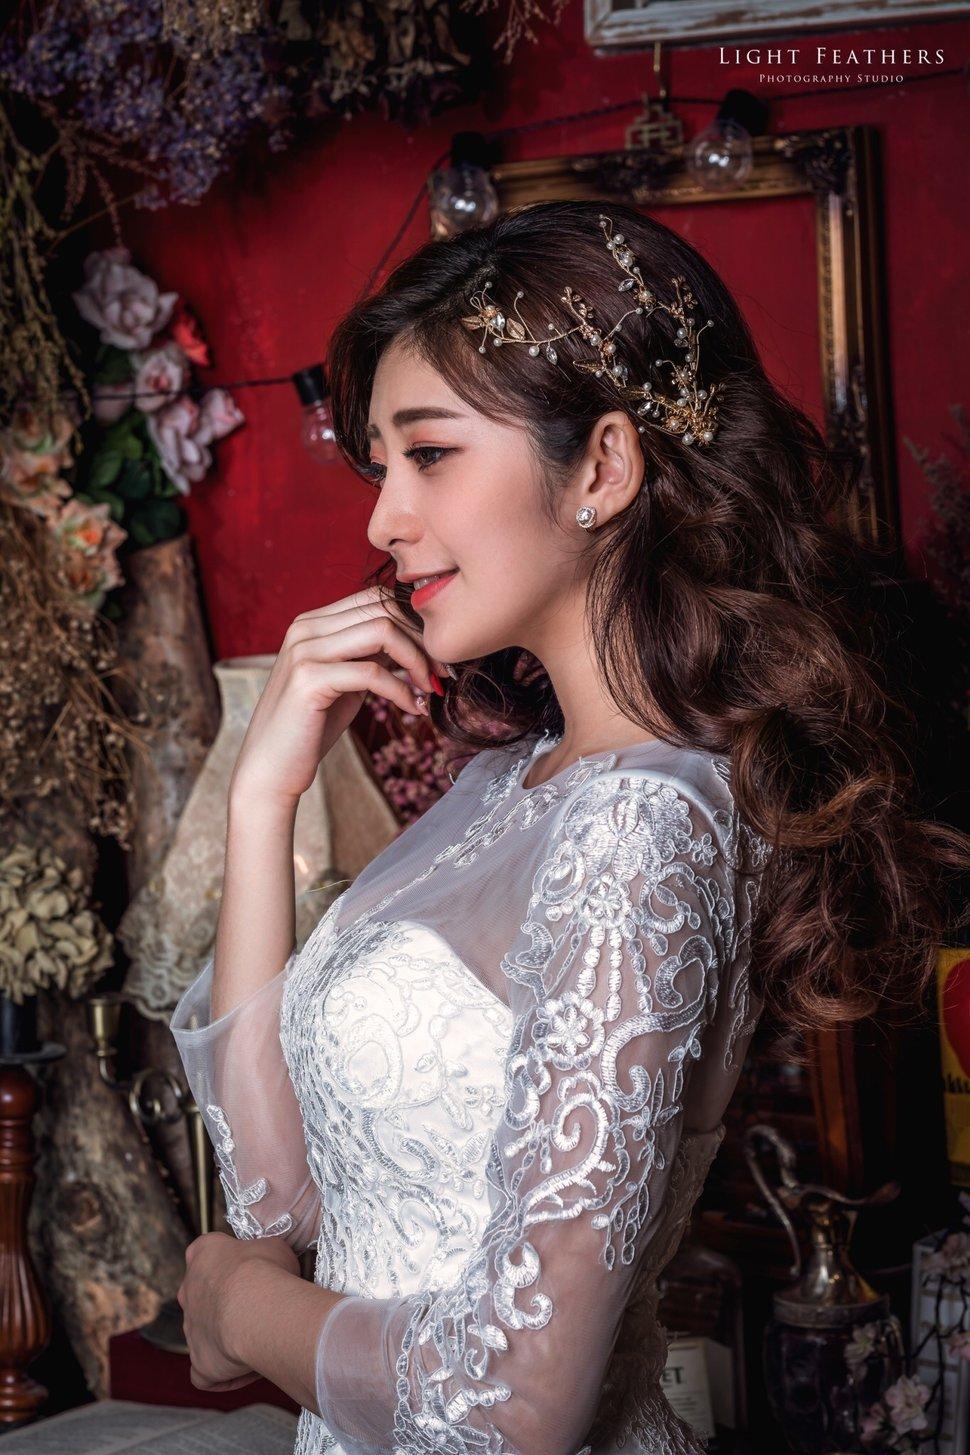 817318B7-A318-47C8-AF6F-F1349154CE82 - 仙美新秘wedding《結婚吧》